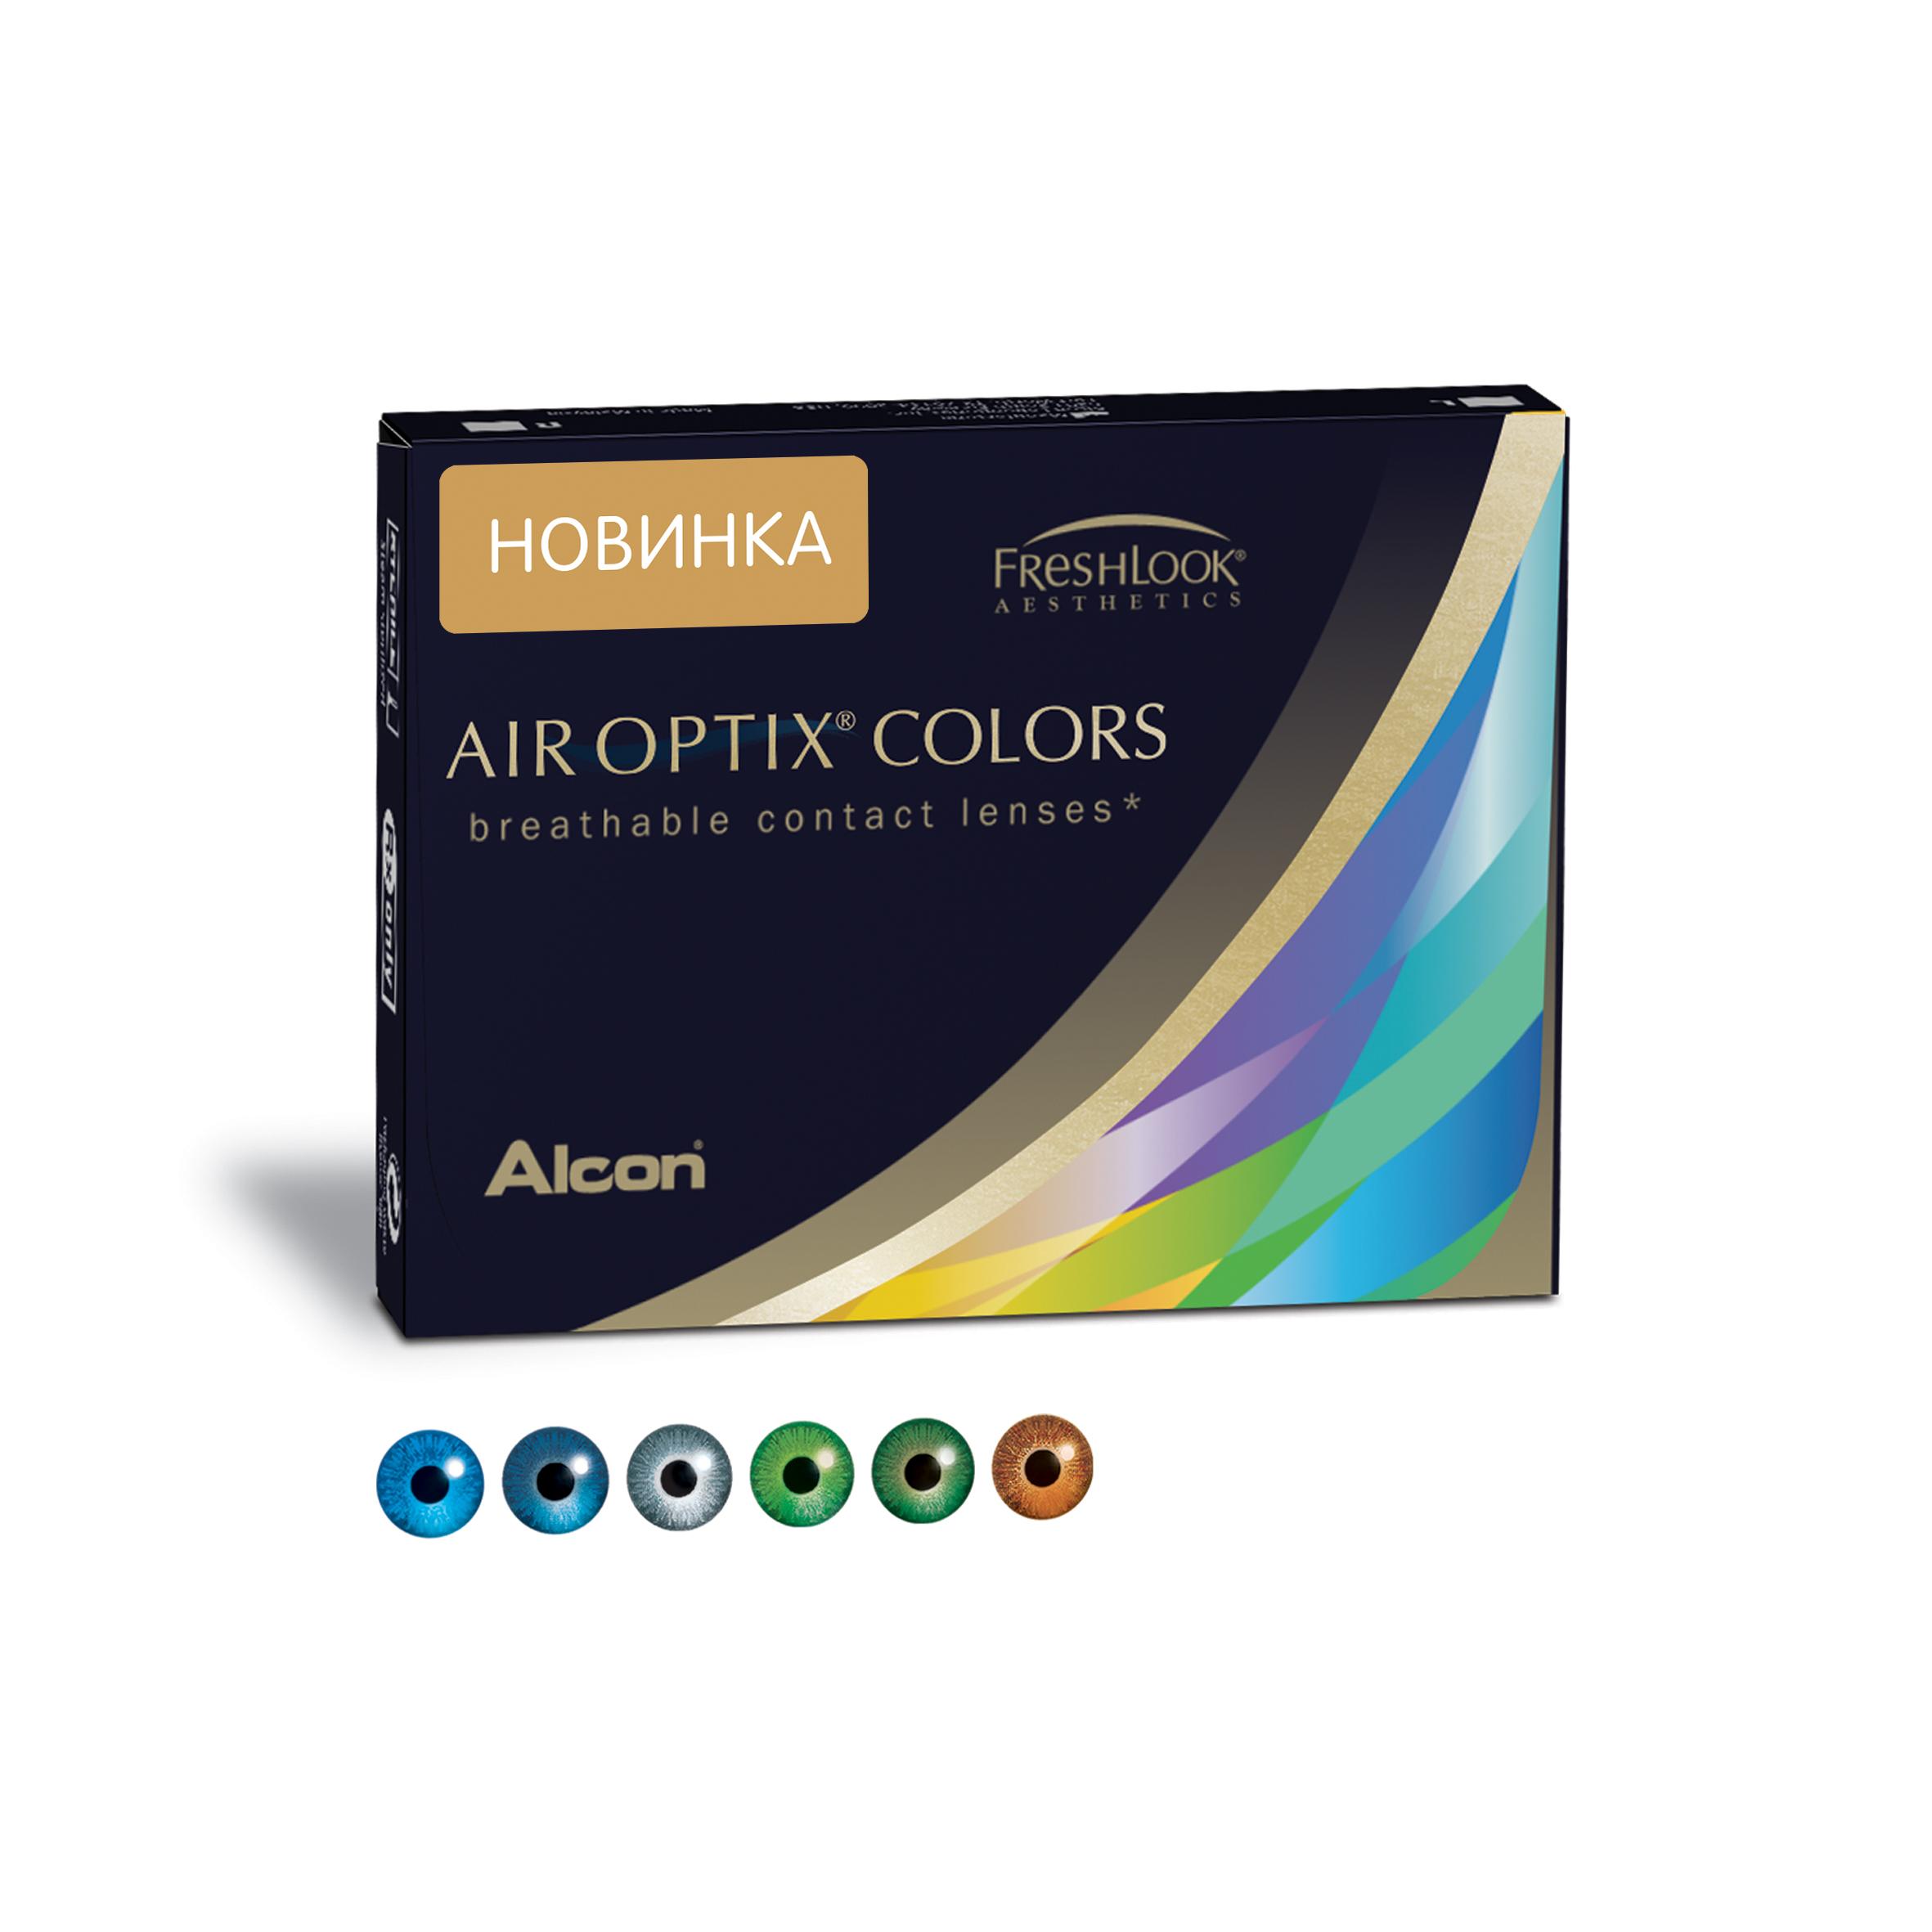 Аlcon контактные линзы Air Optix Colors 2 шт -0.75 Sterling Gray31746120Мягкие контактные линзы